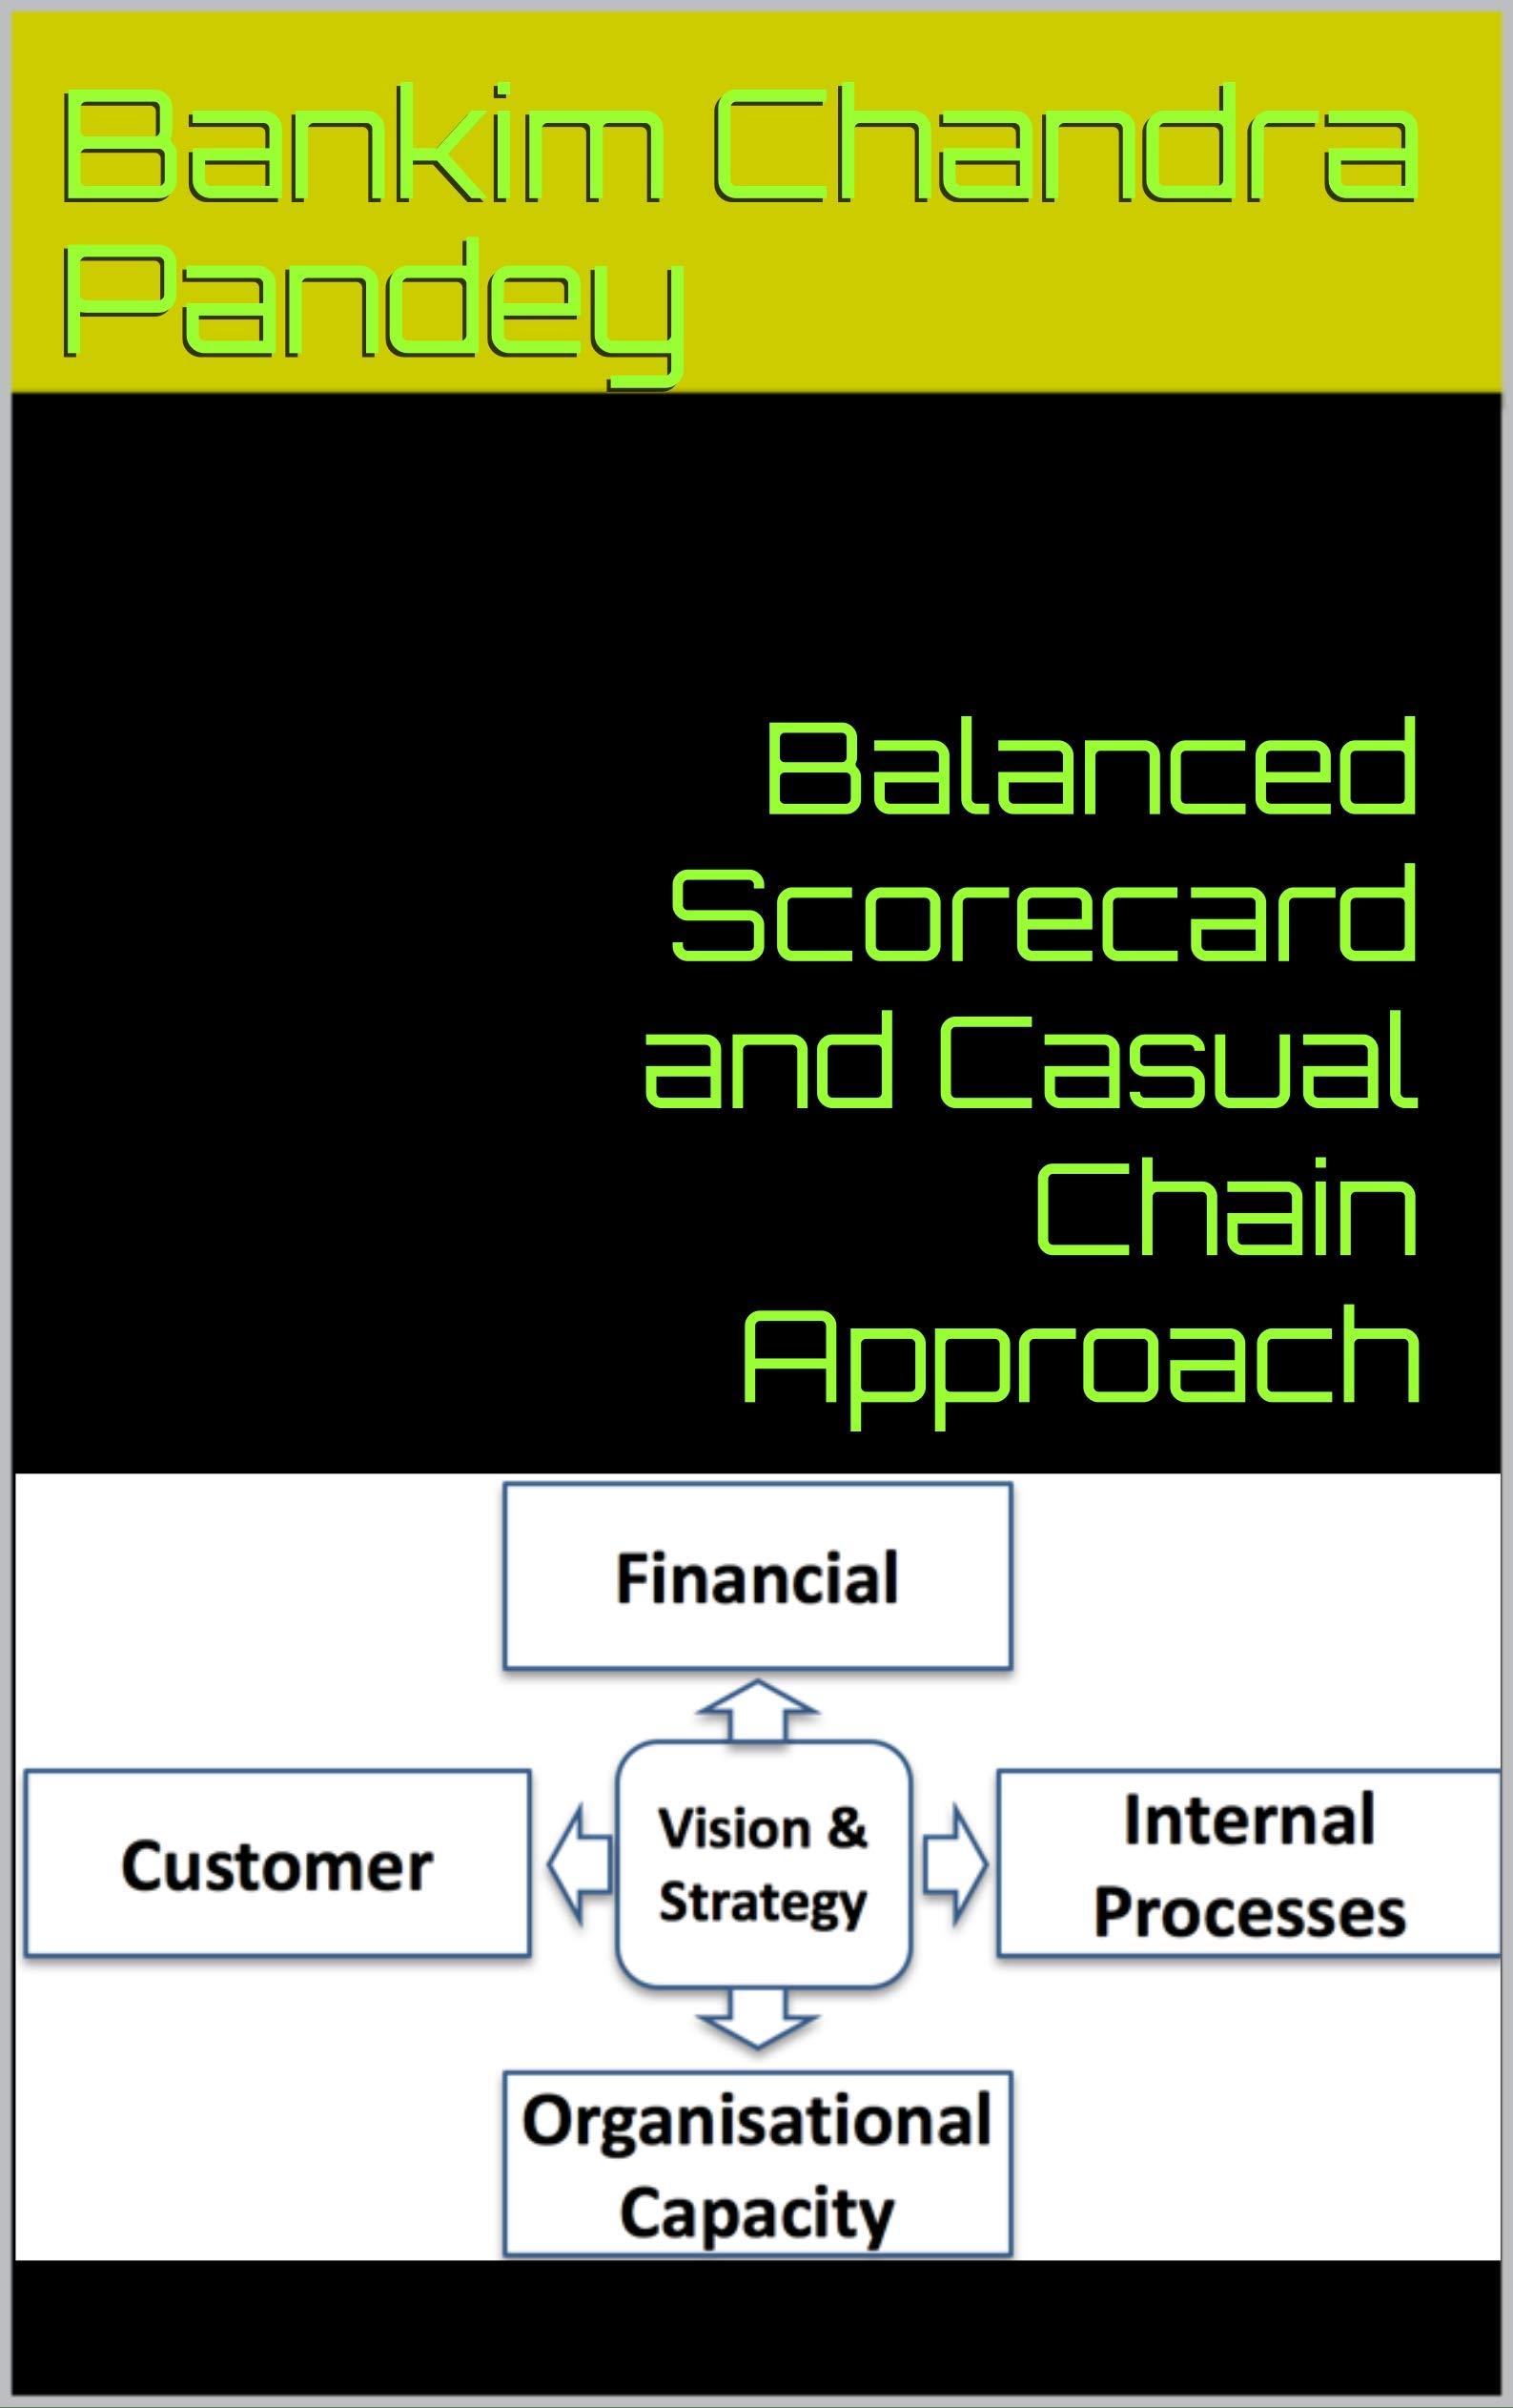 Balanced Scorecard and Casual Chain Approach